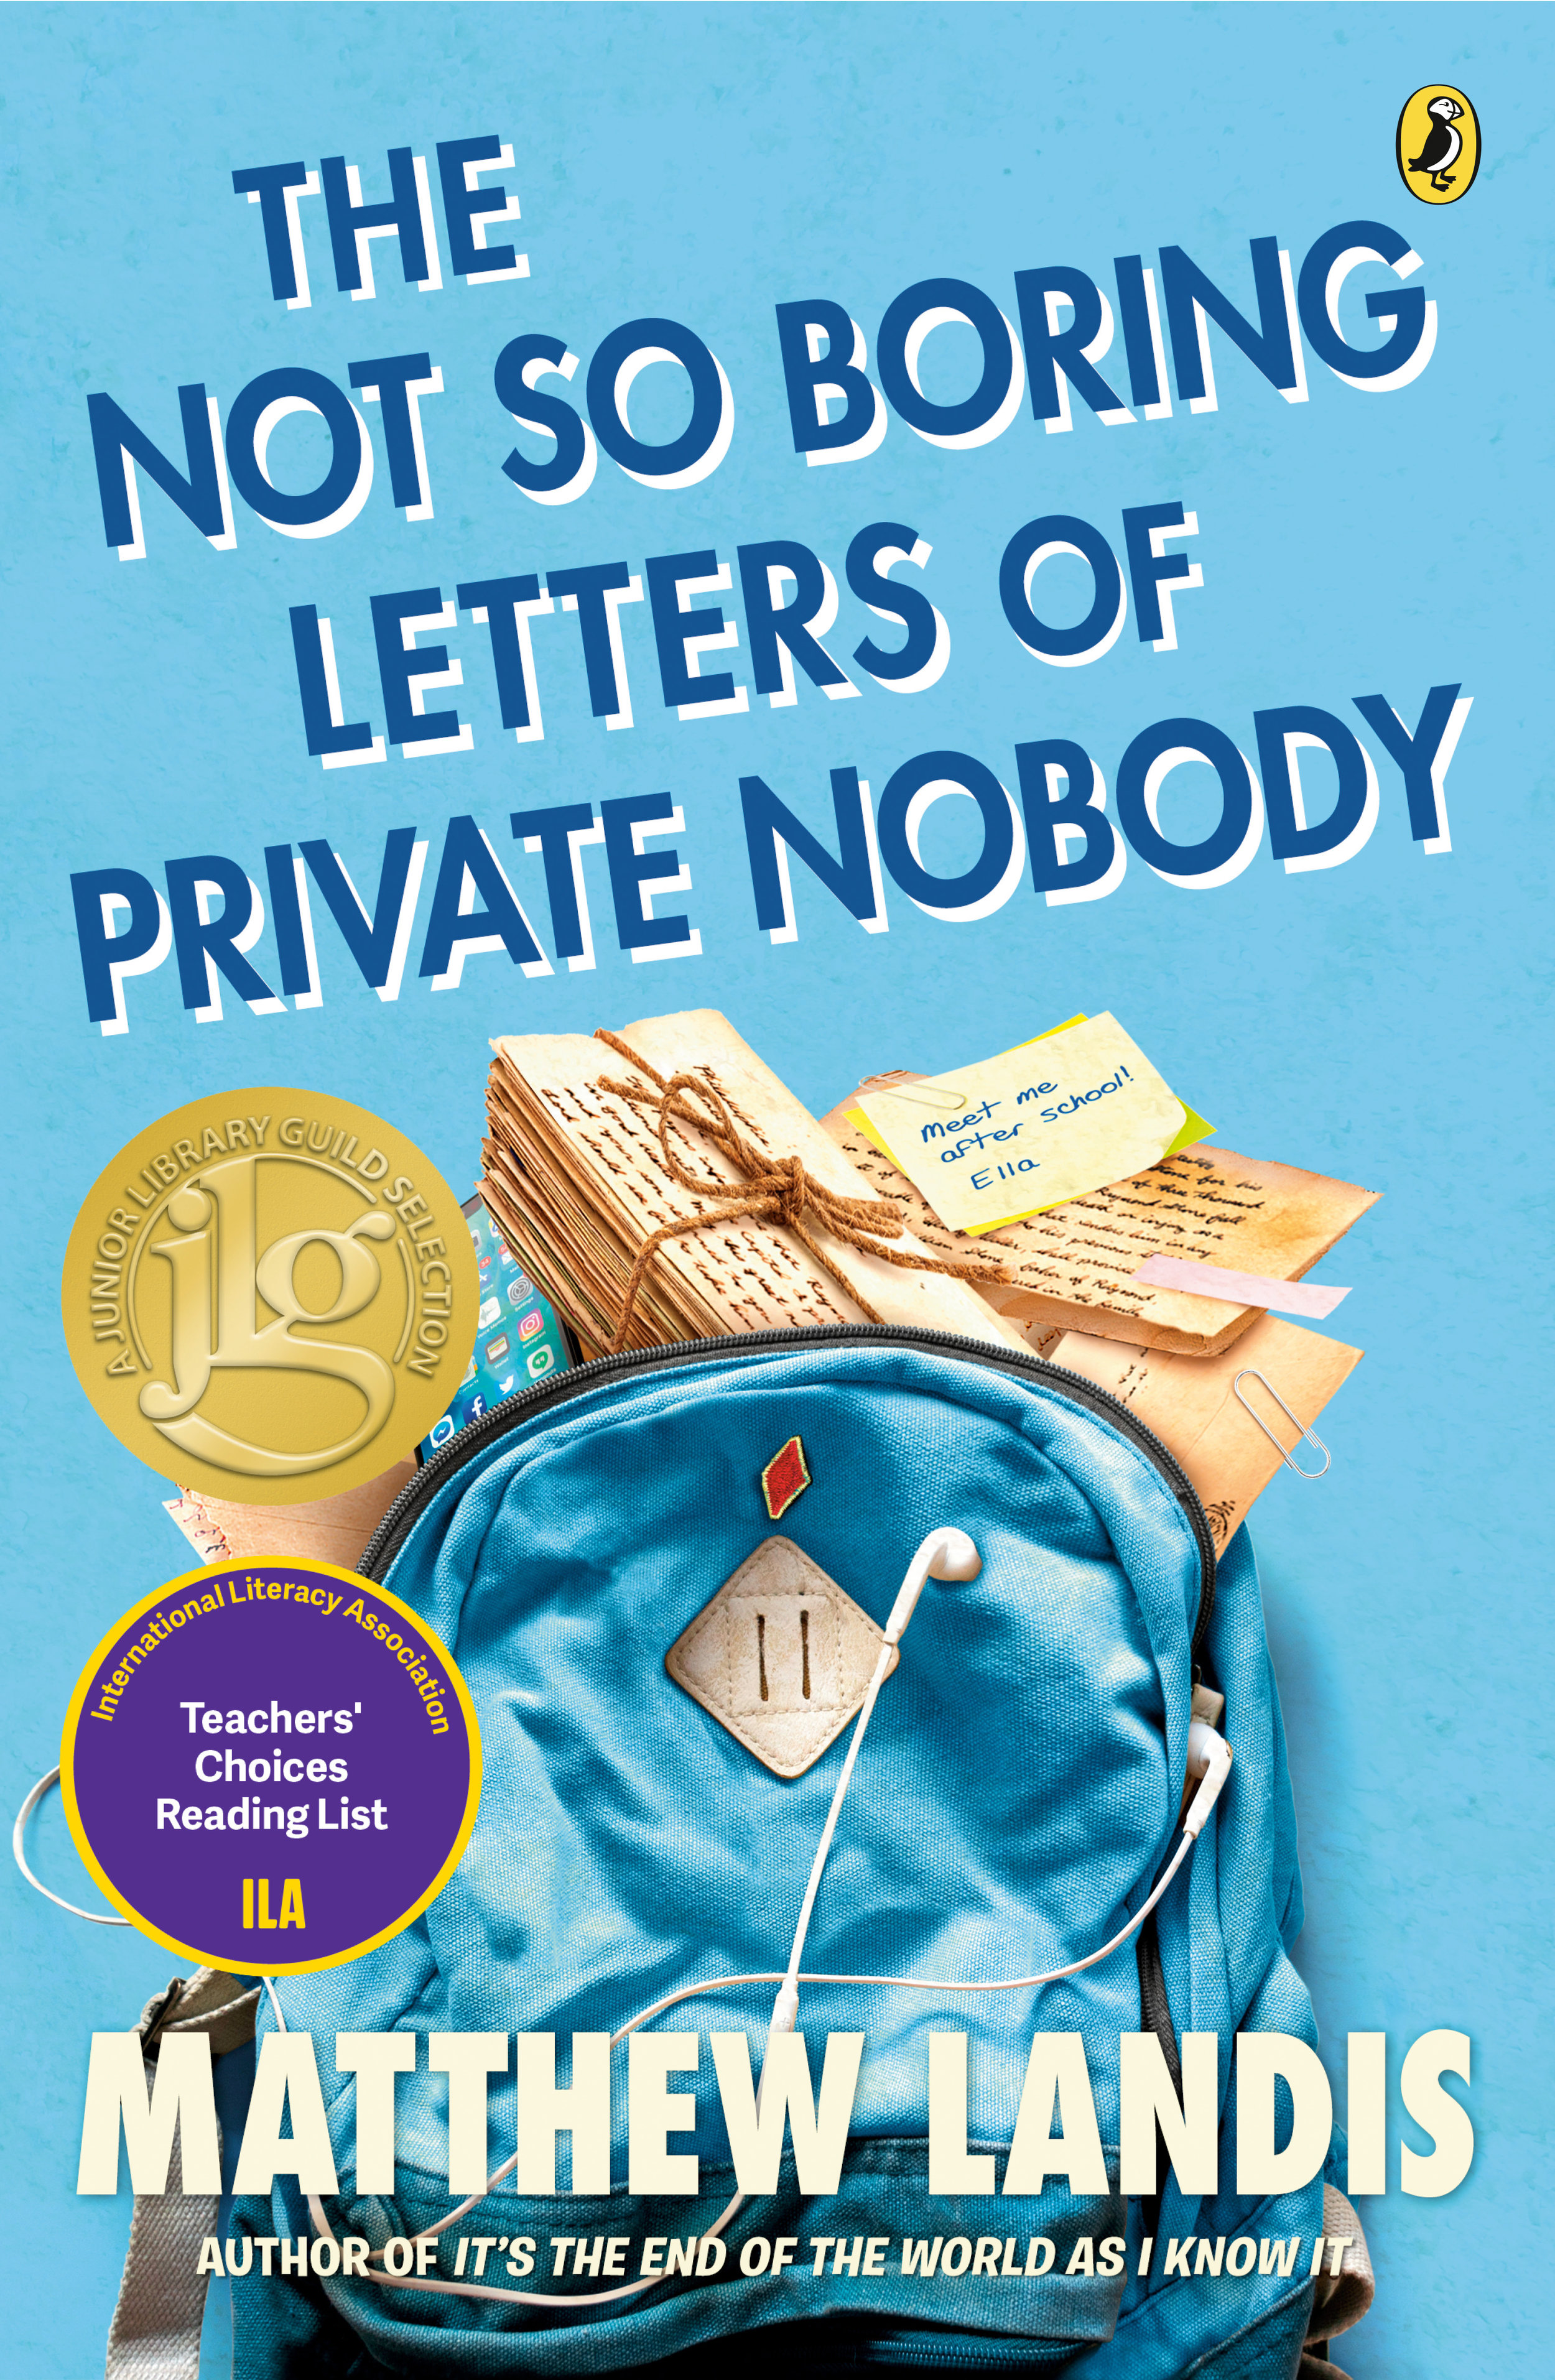 Private Nobody Final Paperback.jpg